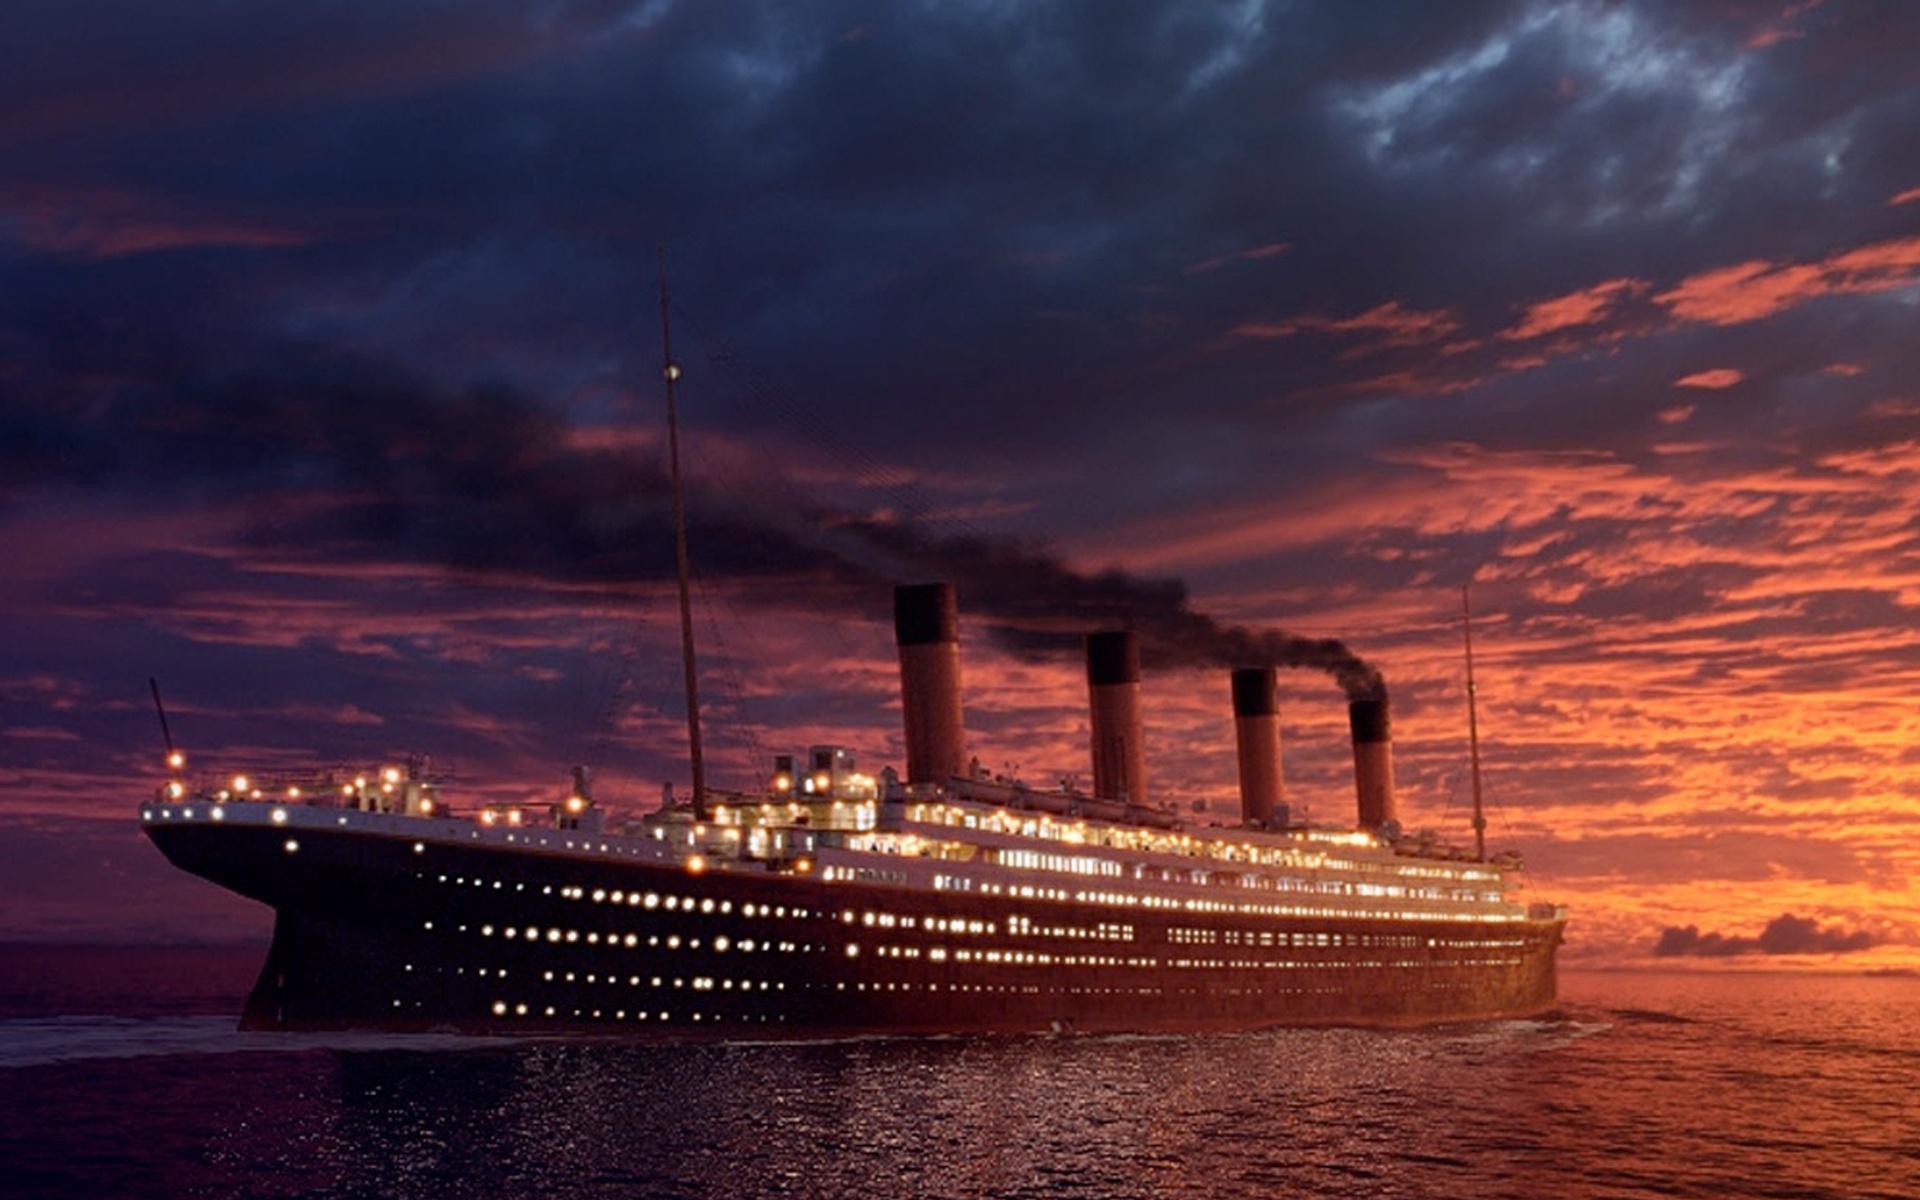 Титаник обои для рабочего стола ...: hq-wallpapers.ru/wallpapers/films/pic3657_raz1920x1200